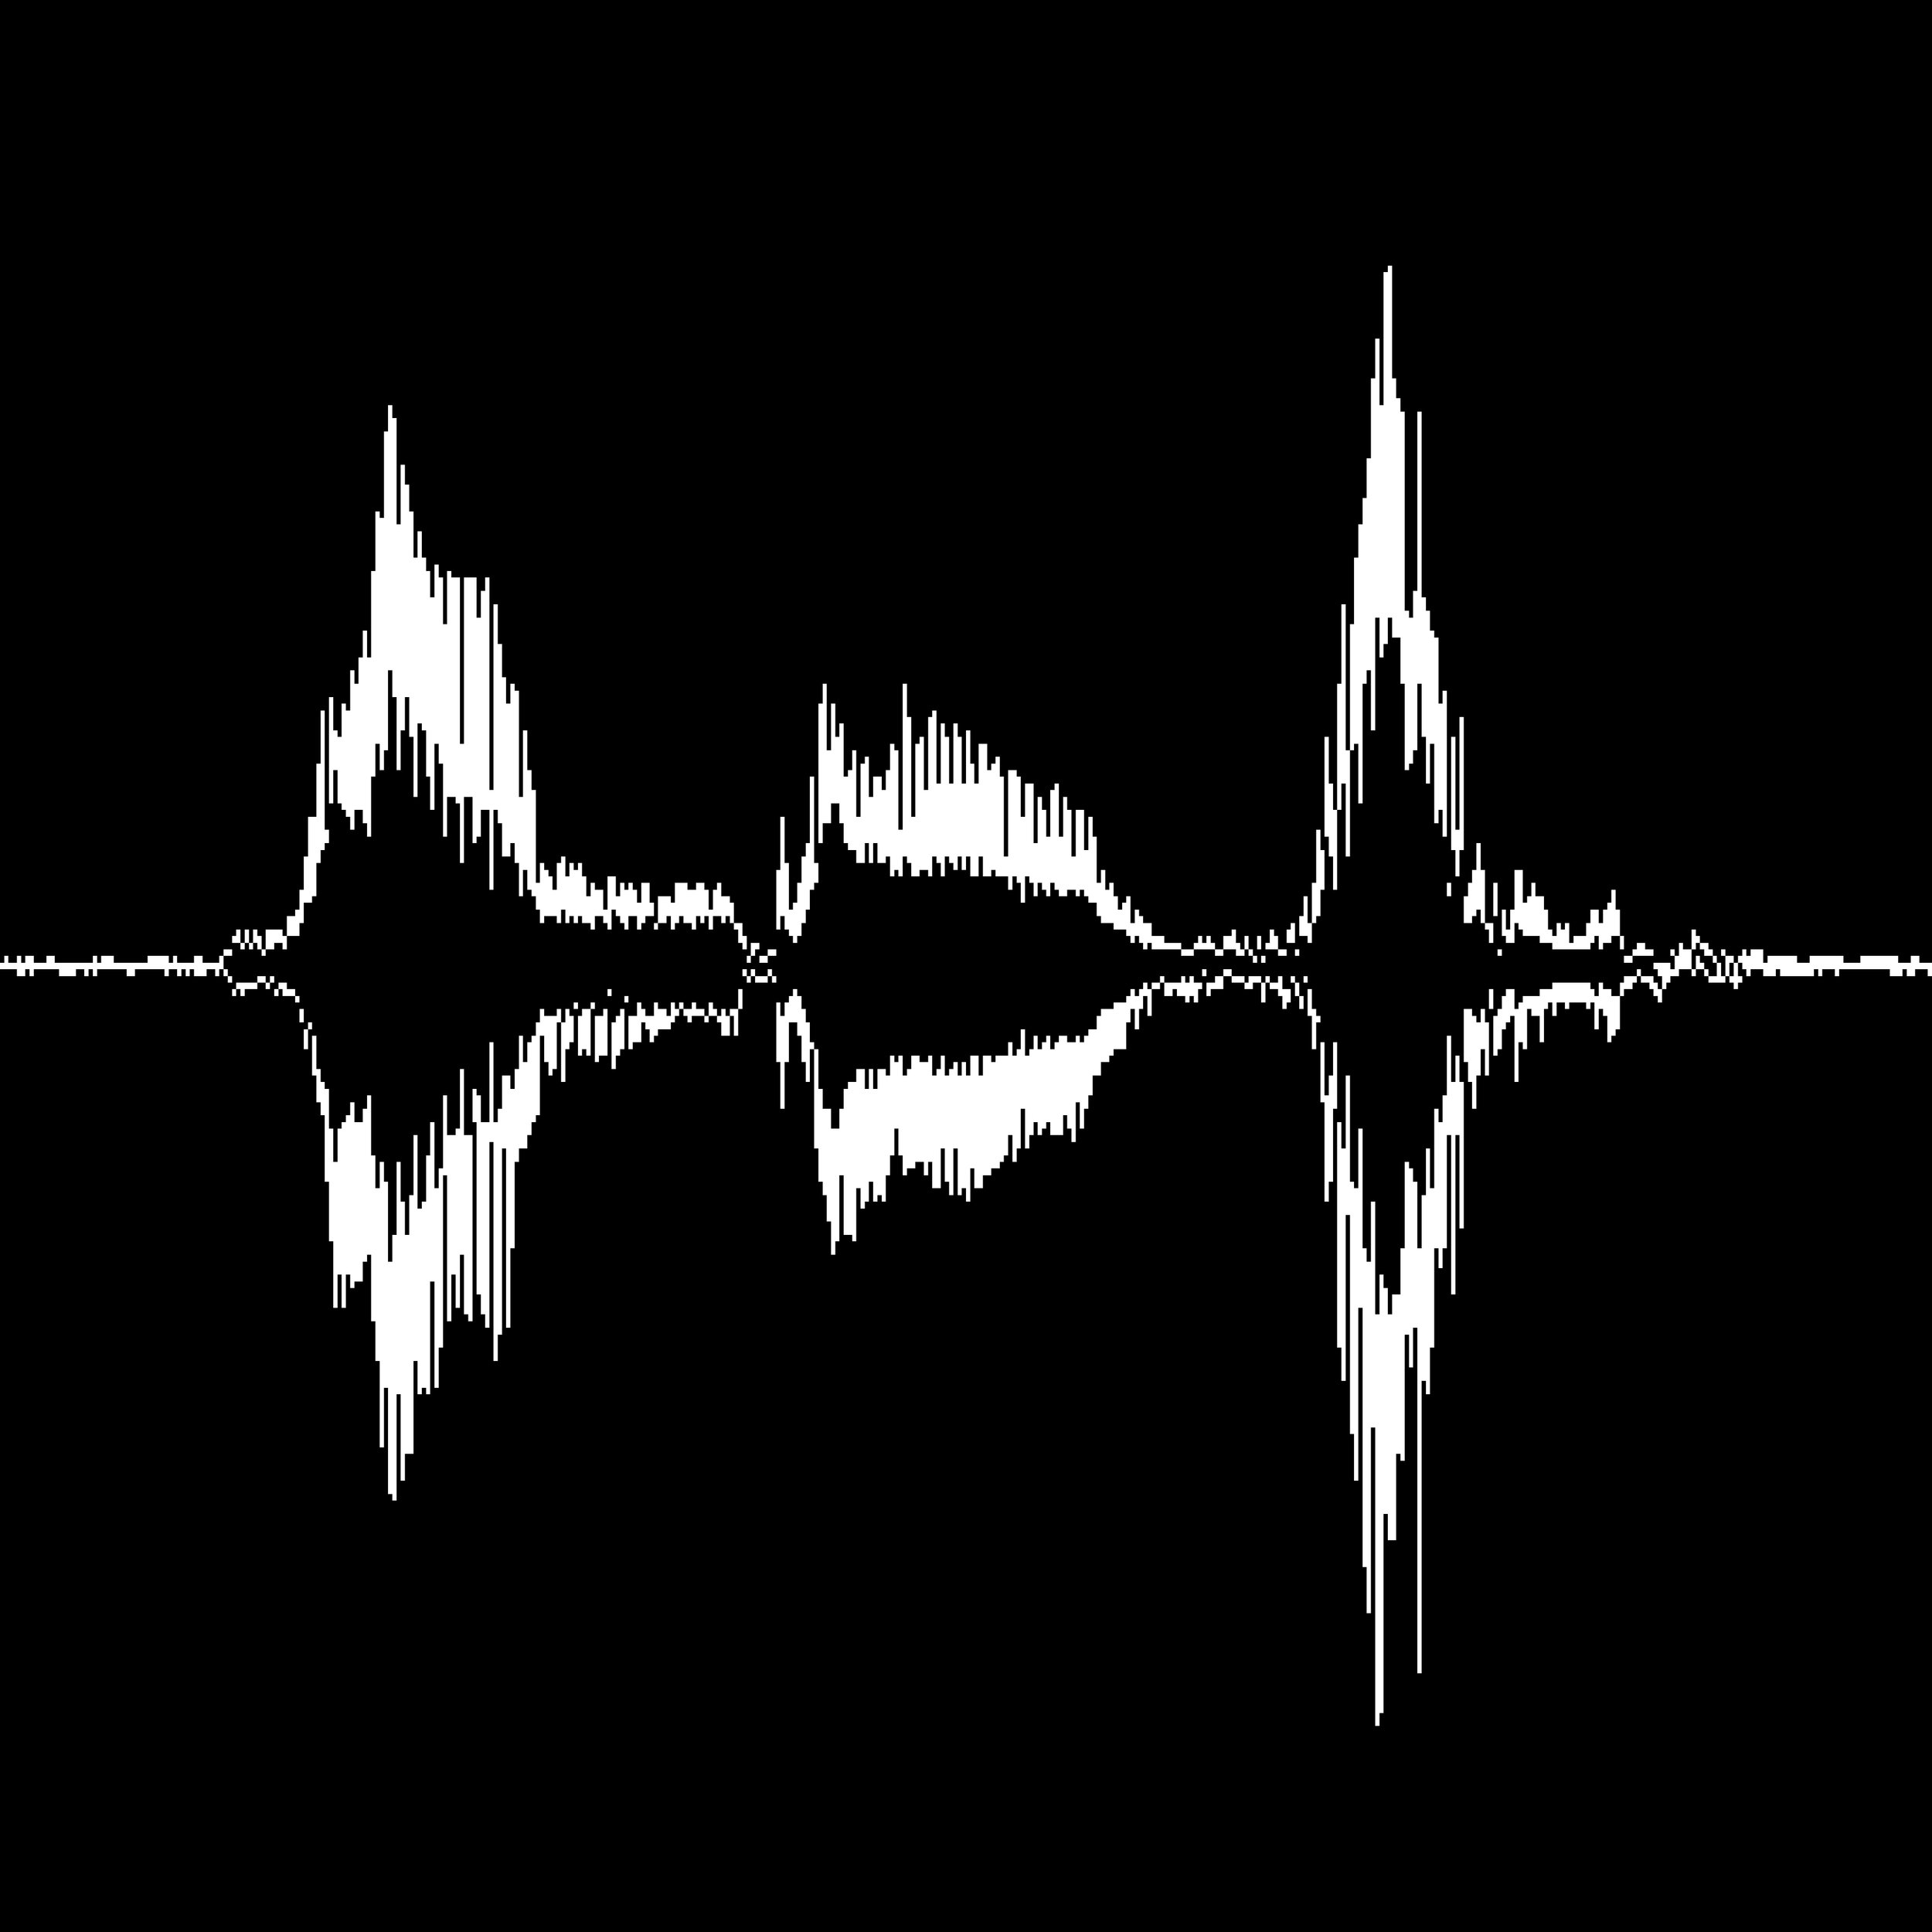 back to black - black backdrop with white soundwave